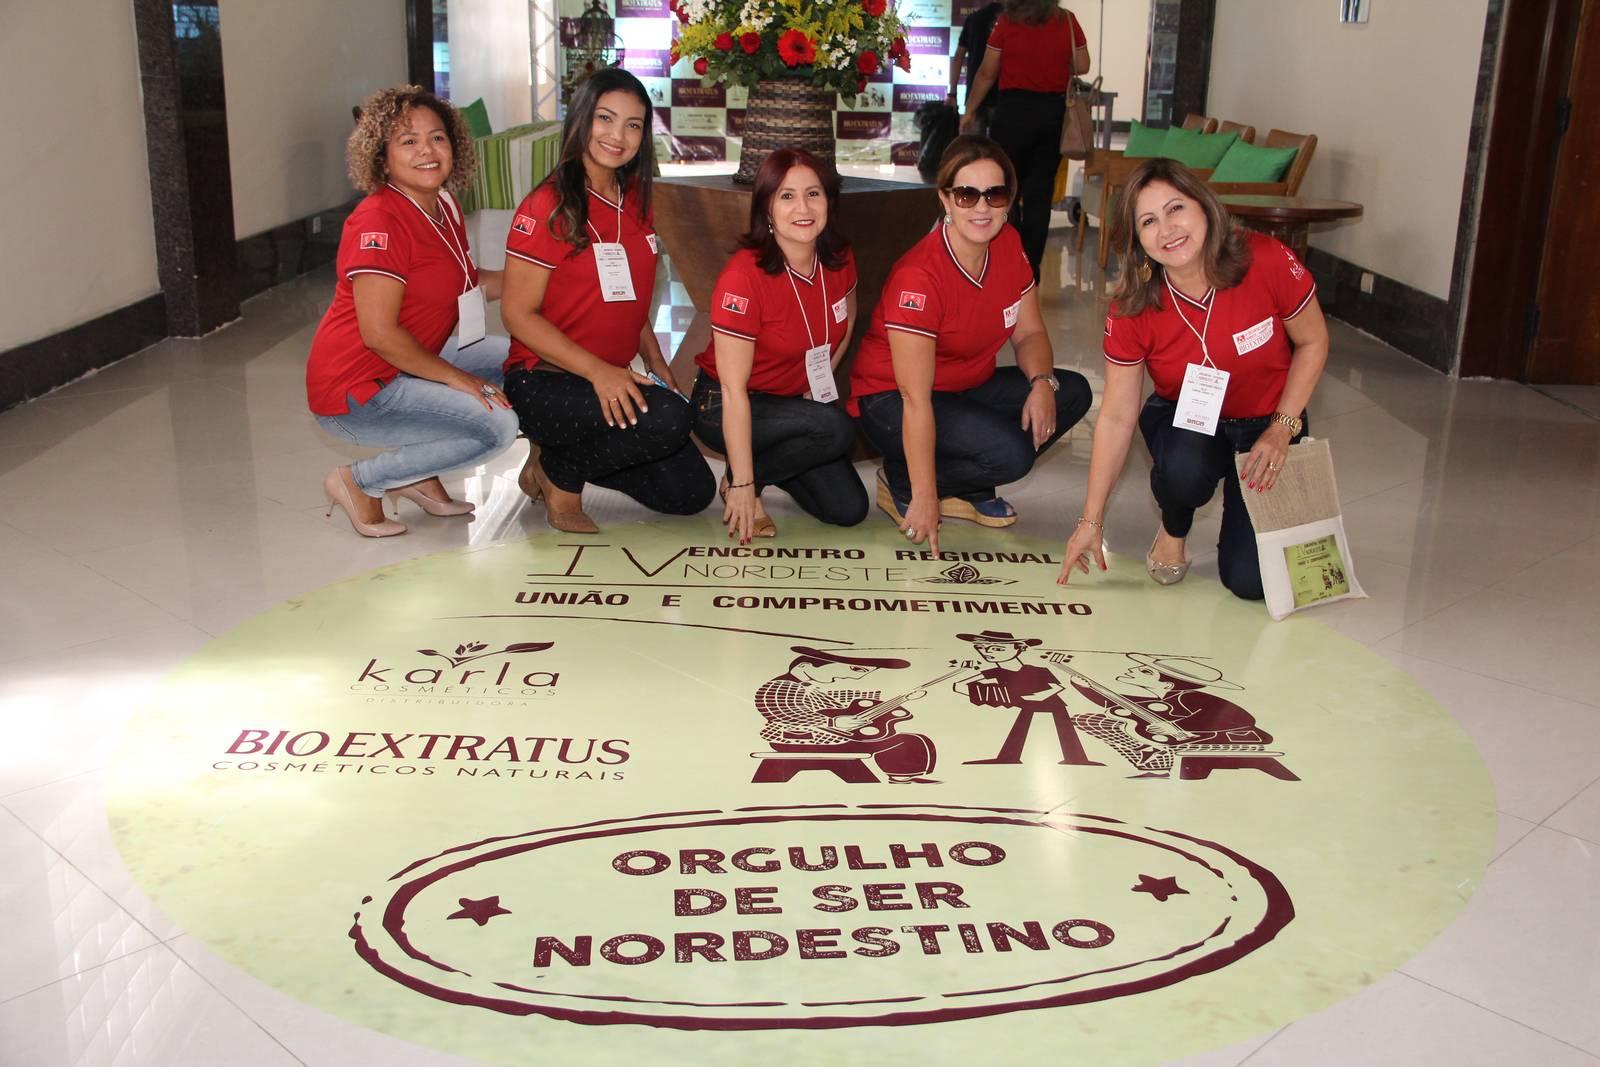 IV Encontro Regional do Nordeste - Bio Extratus (39)